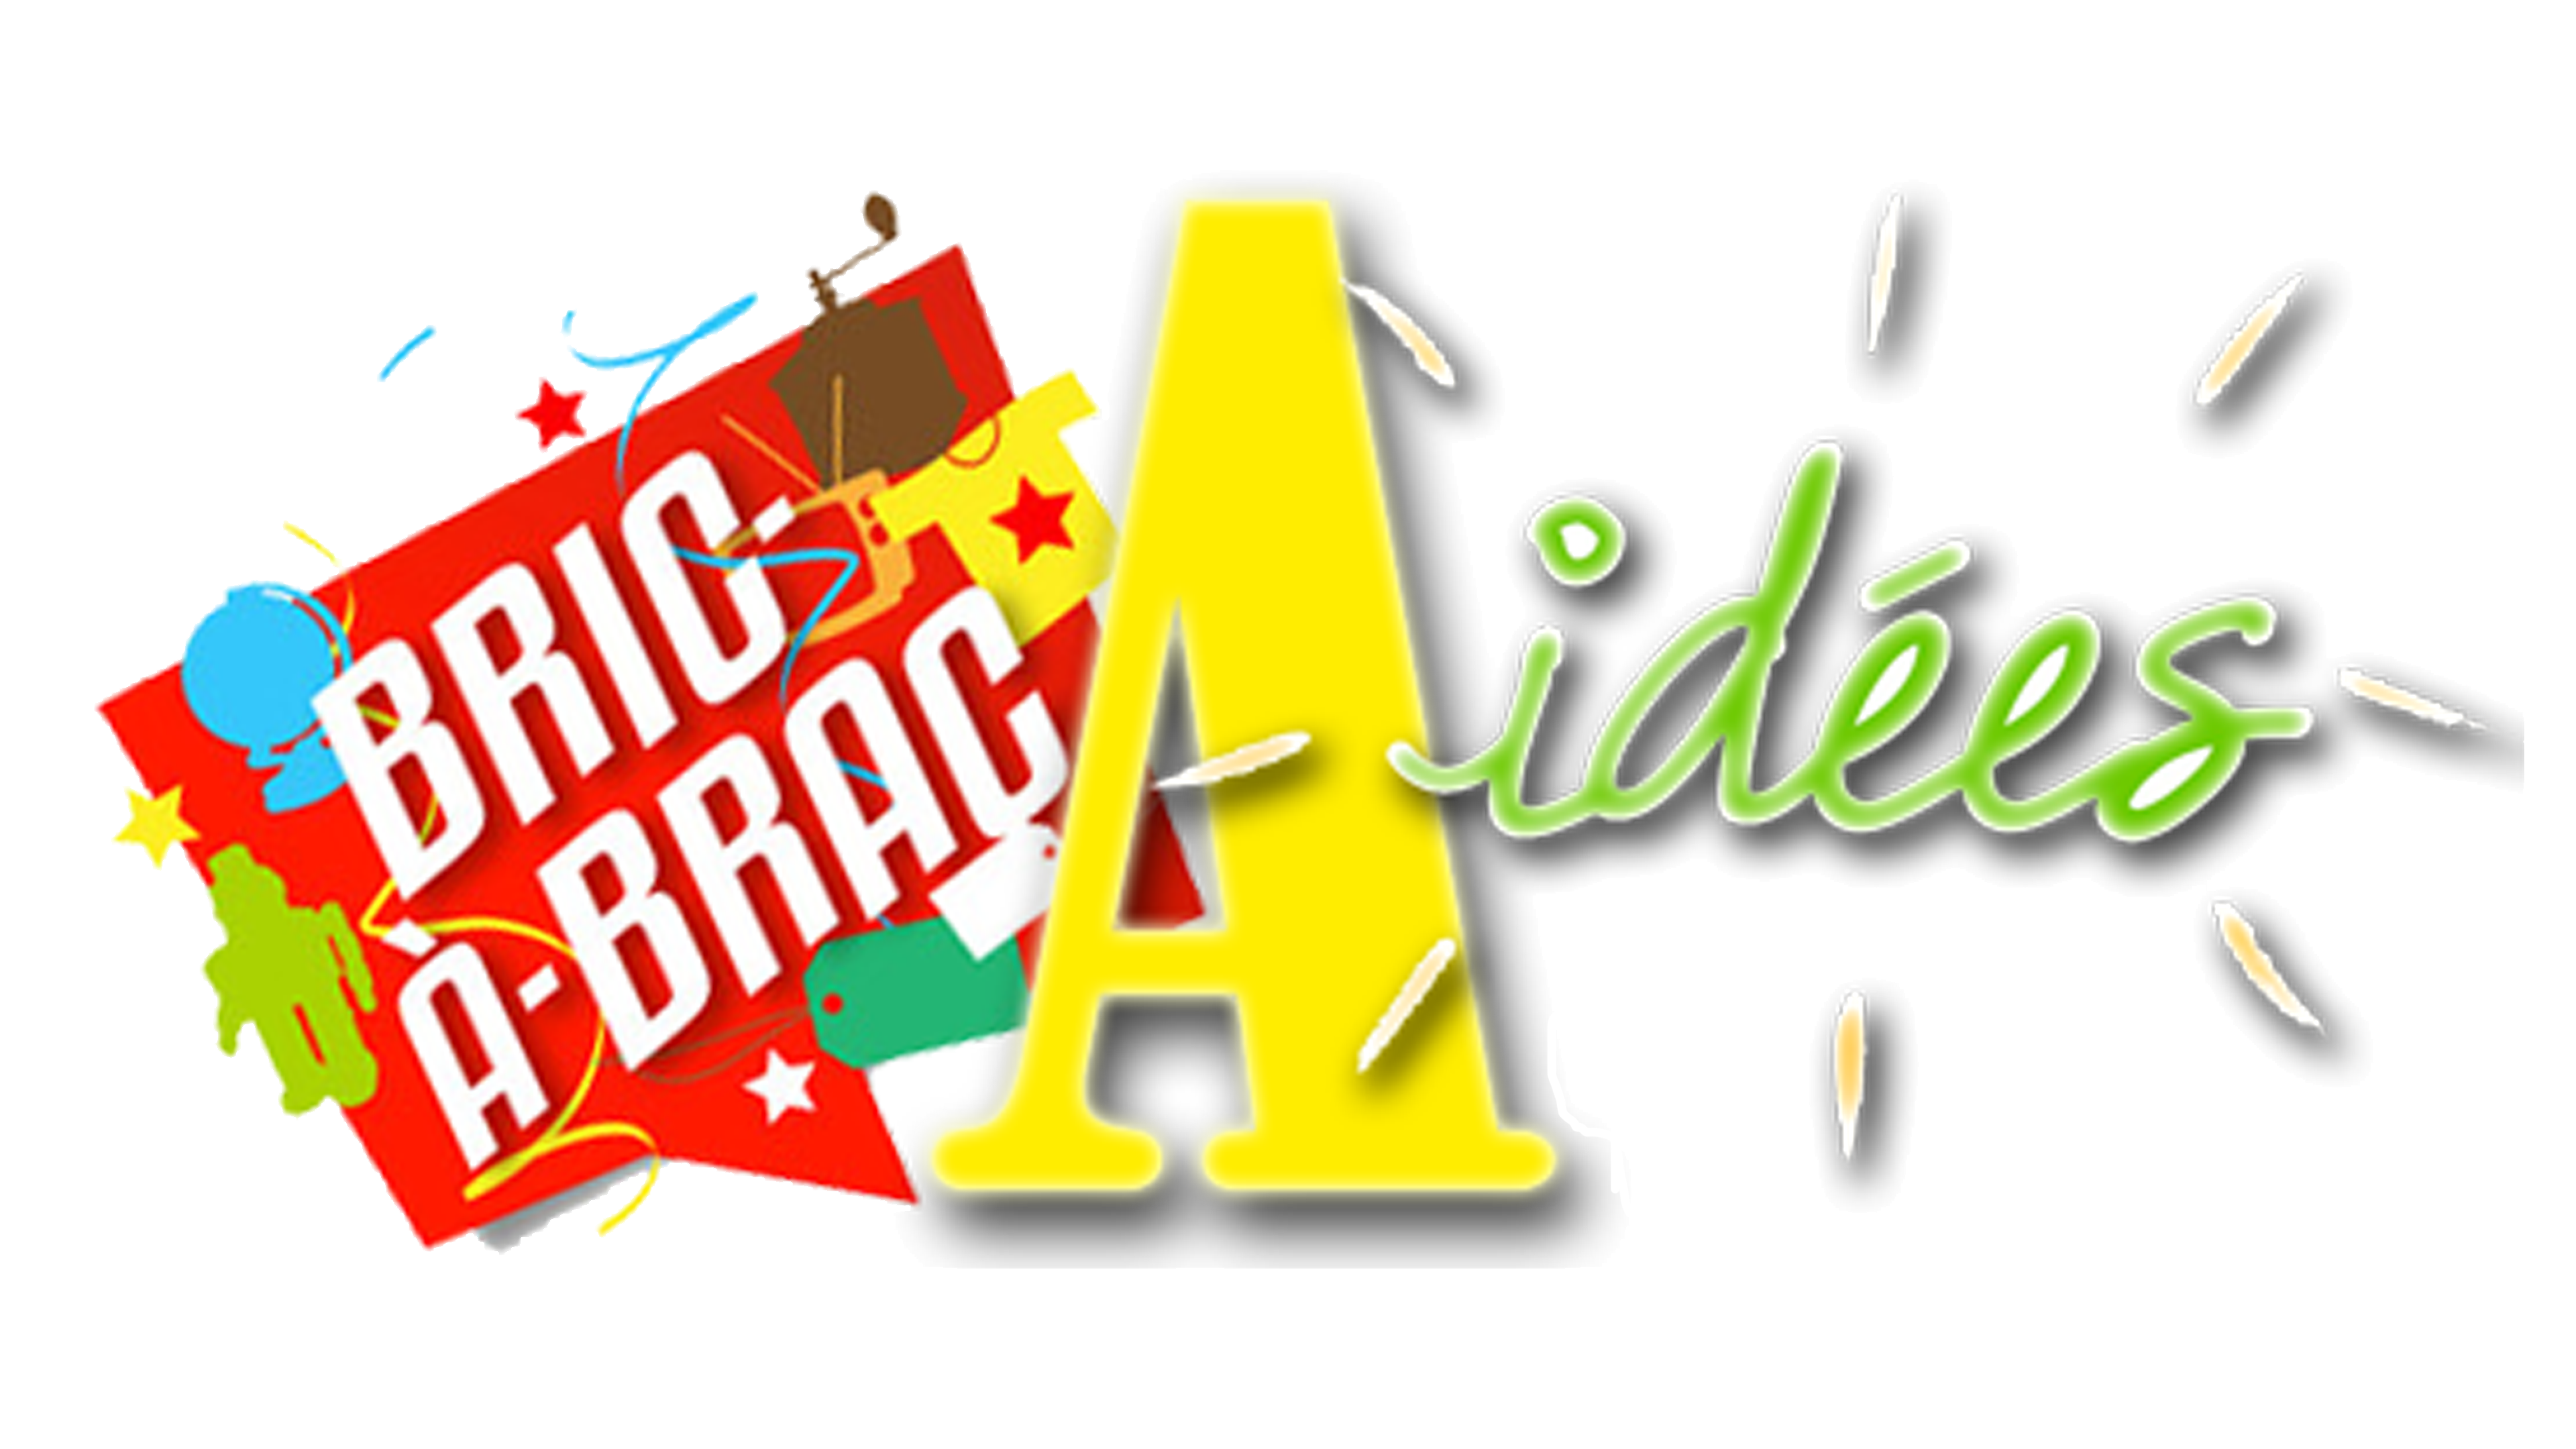 Bric à Brac à idées du 19/02/2020